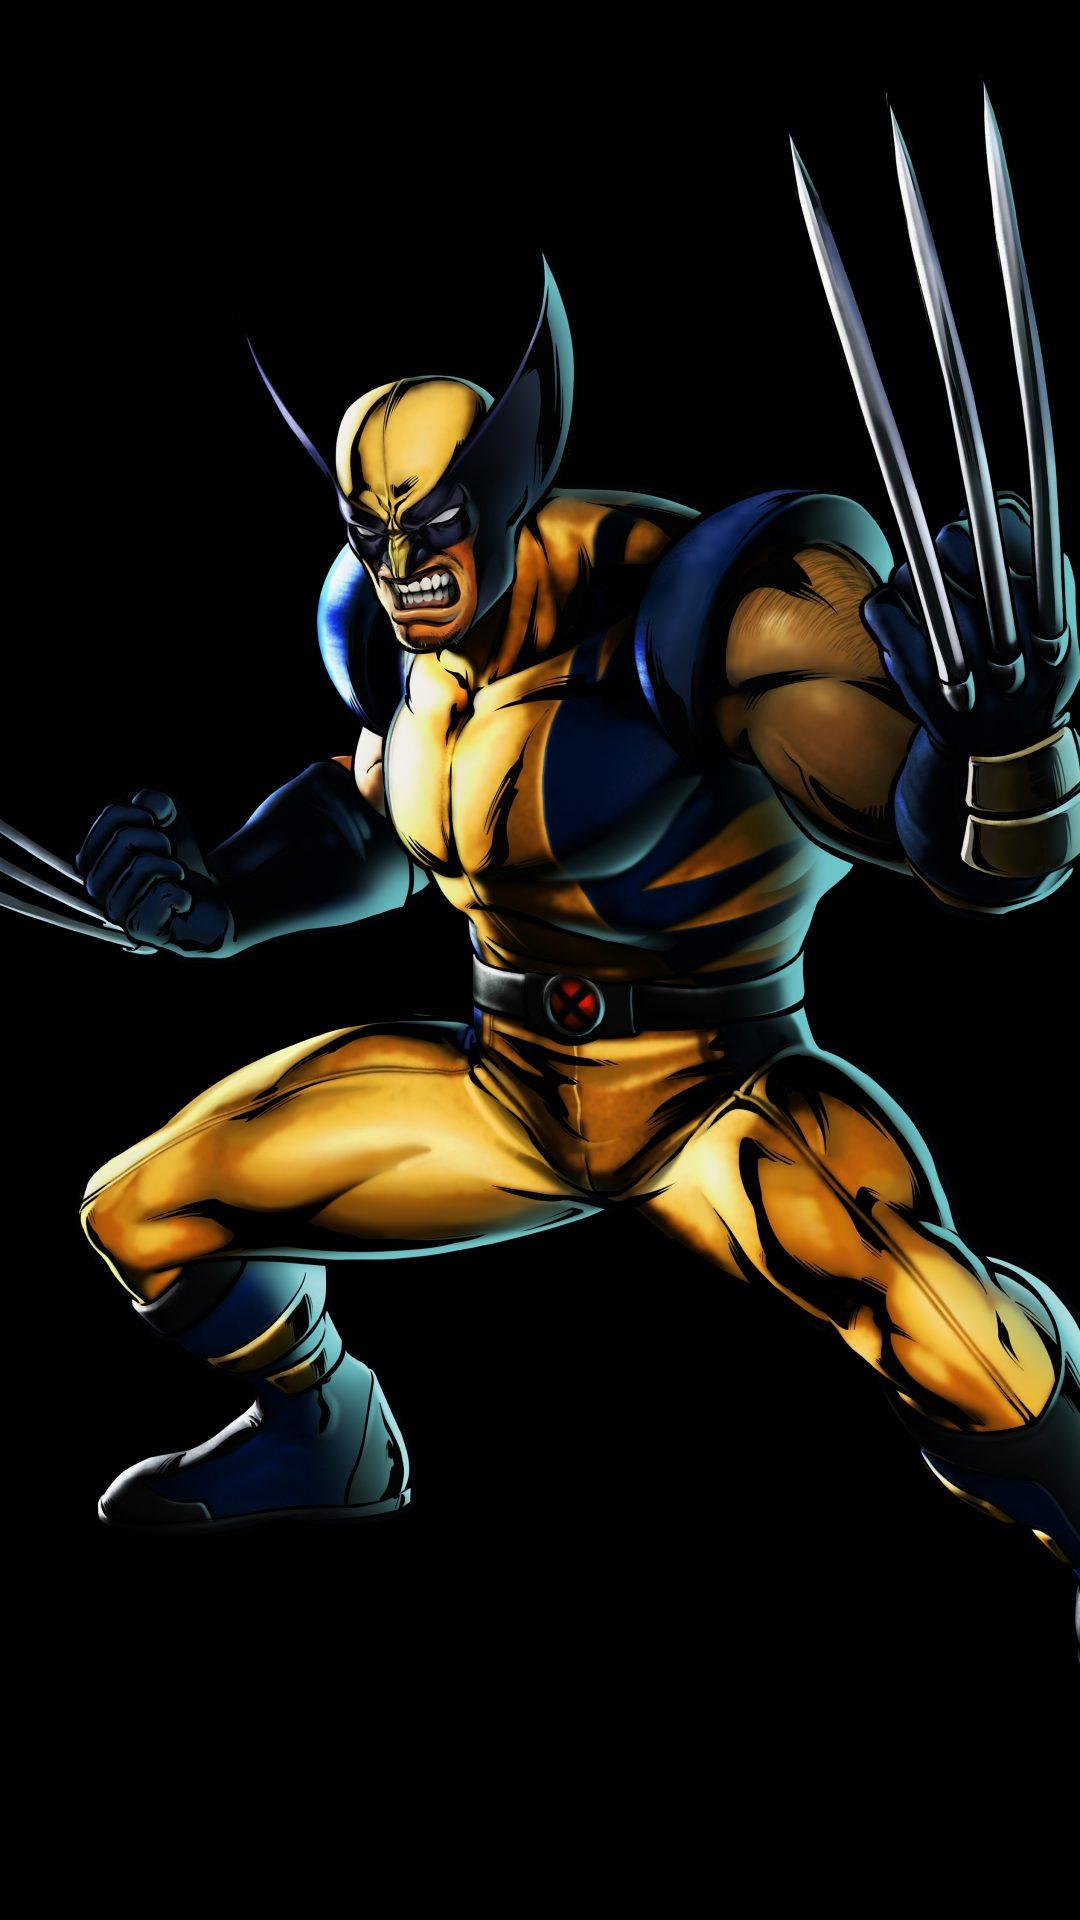 Wolverine (Marvel Comics) 8K UHD Wallpaper